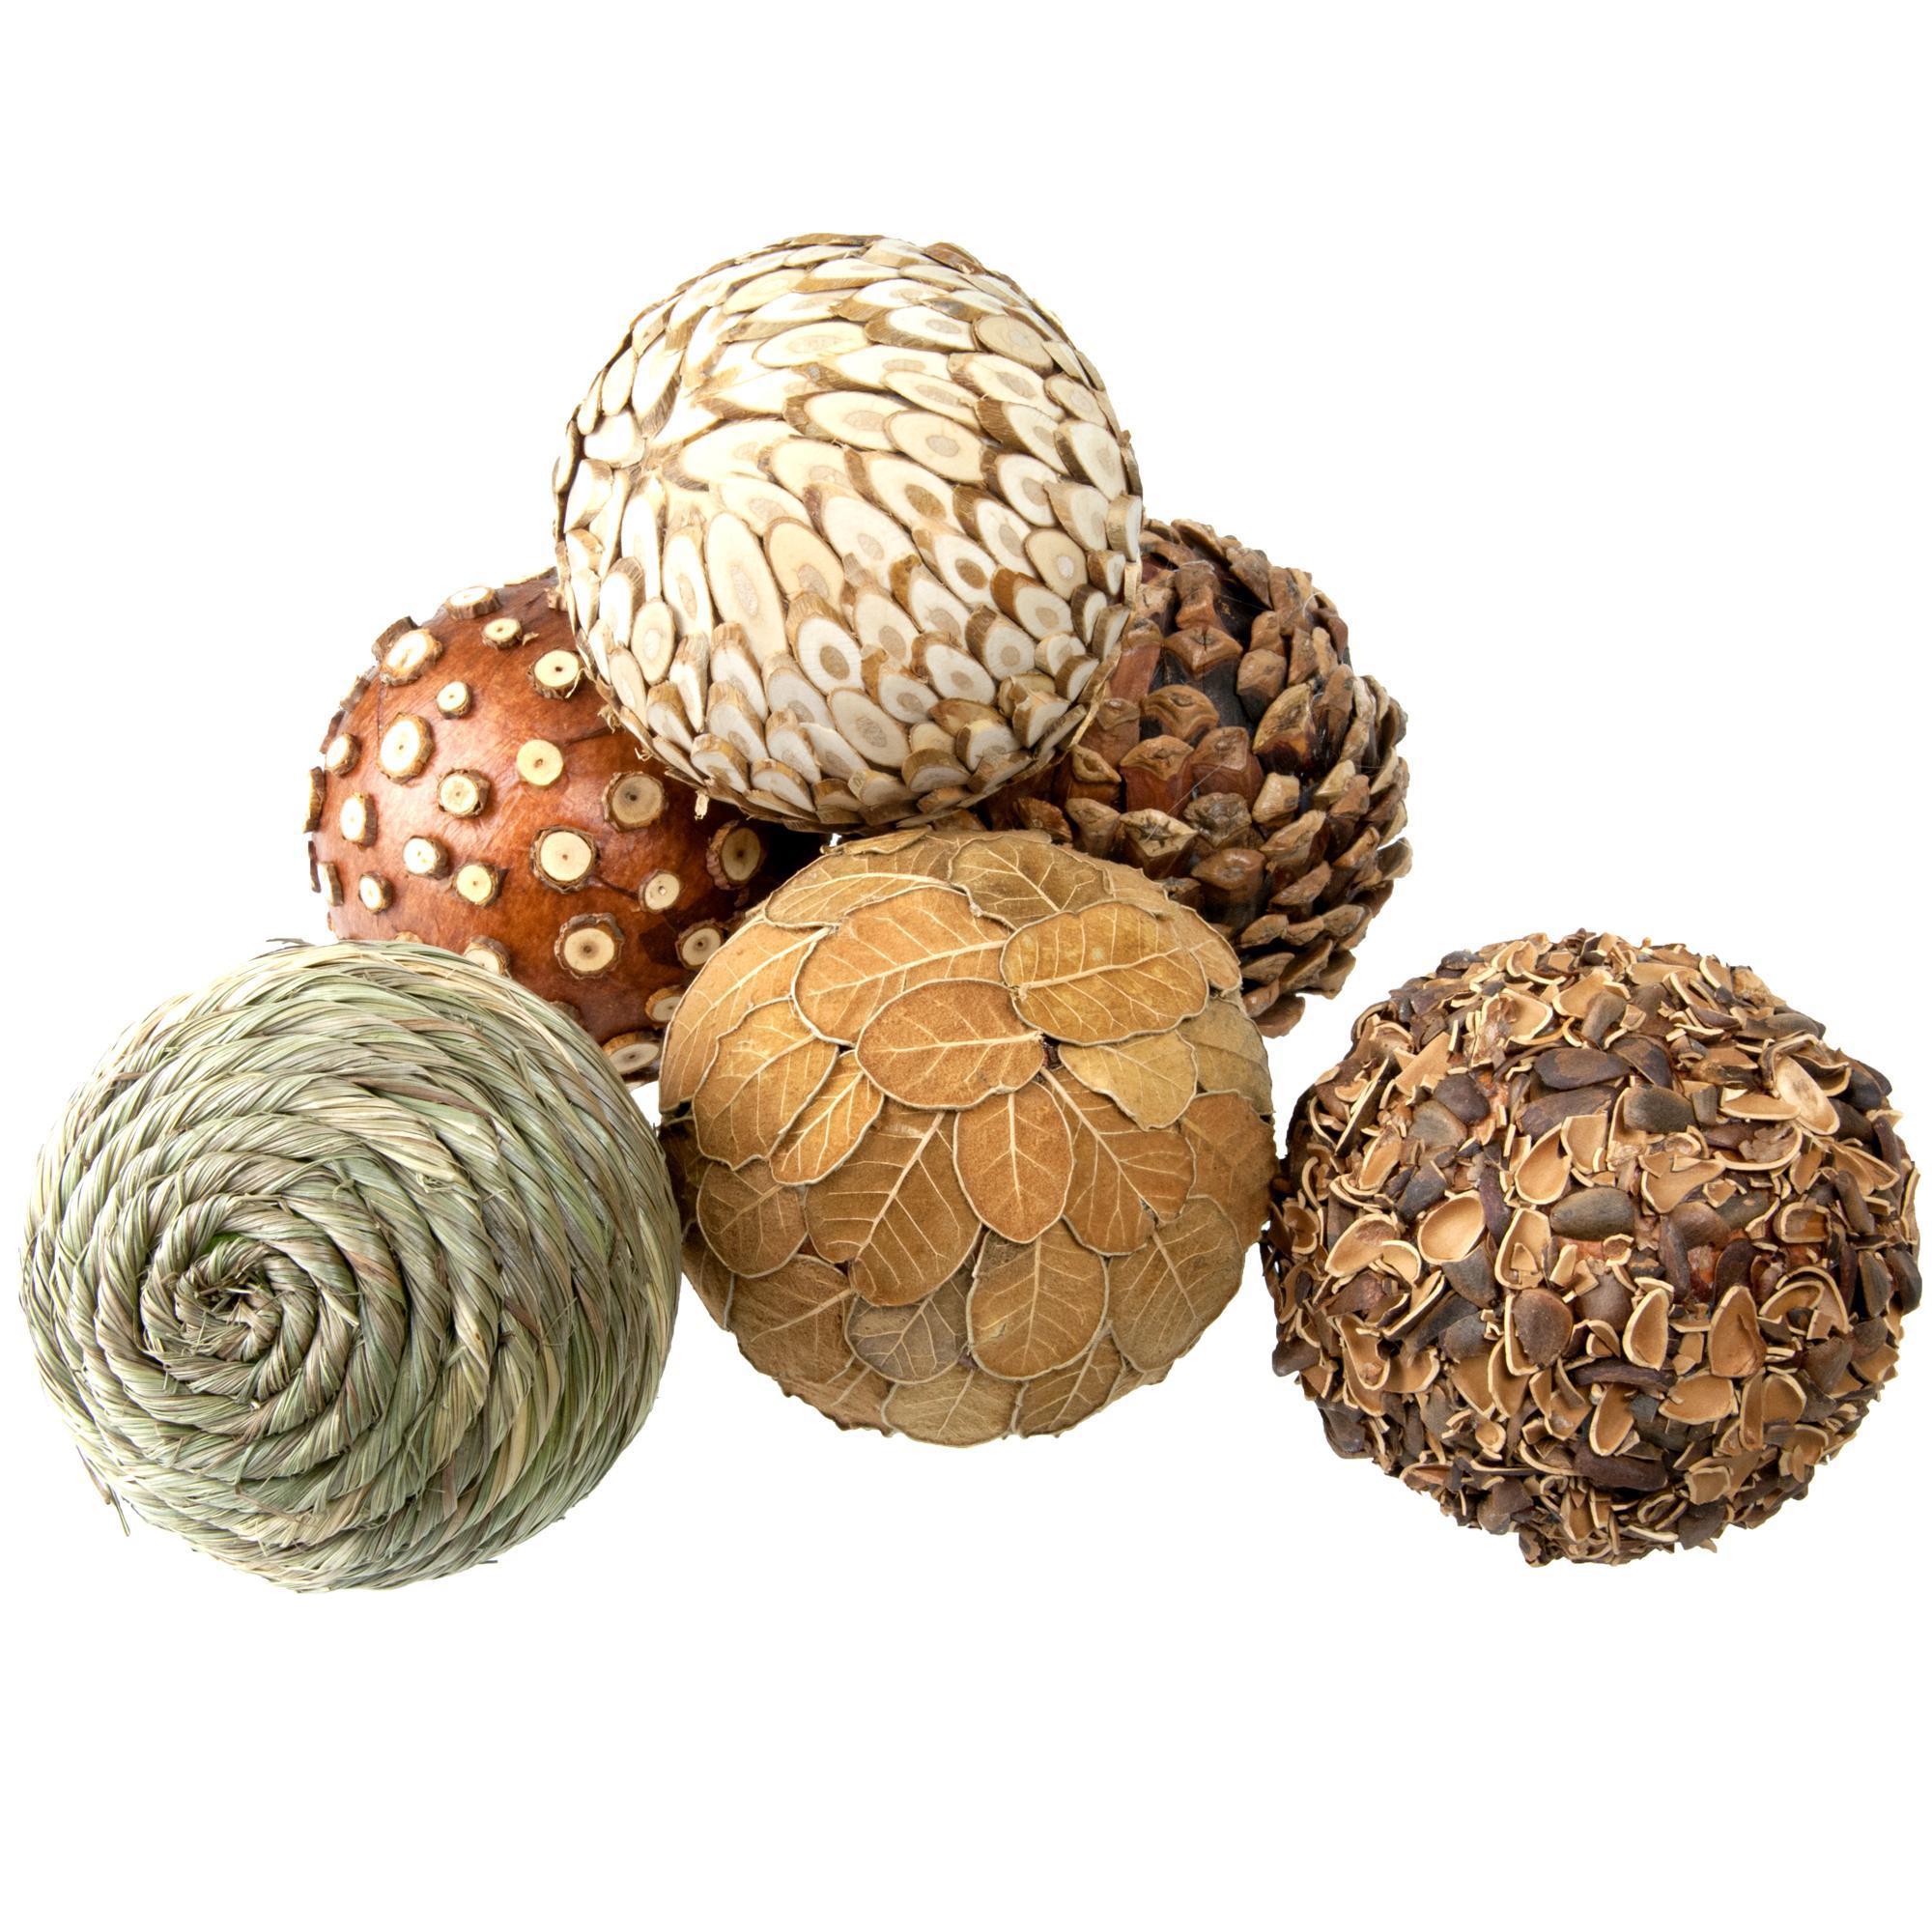 Natural Decorative Balls Impressive Natural Decorative Balls  Set Of 6  Chairish Decorating Inspiration